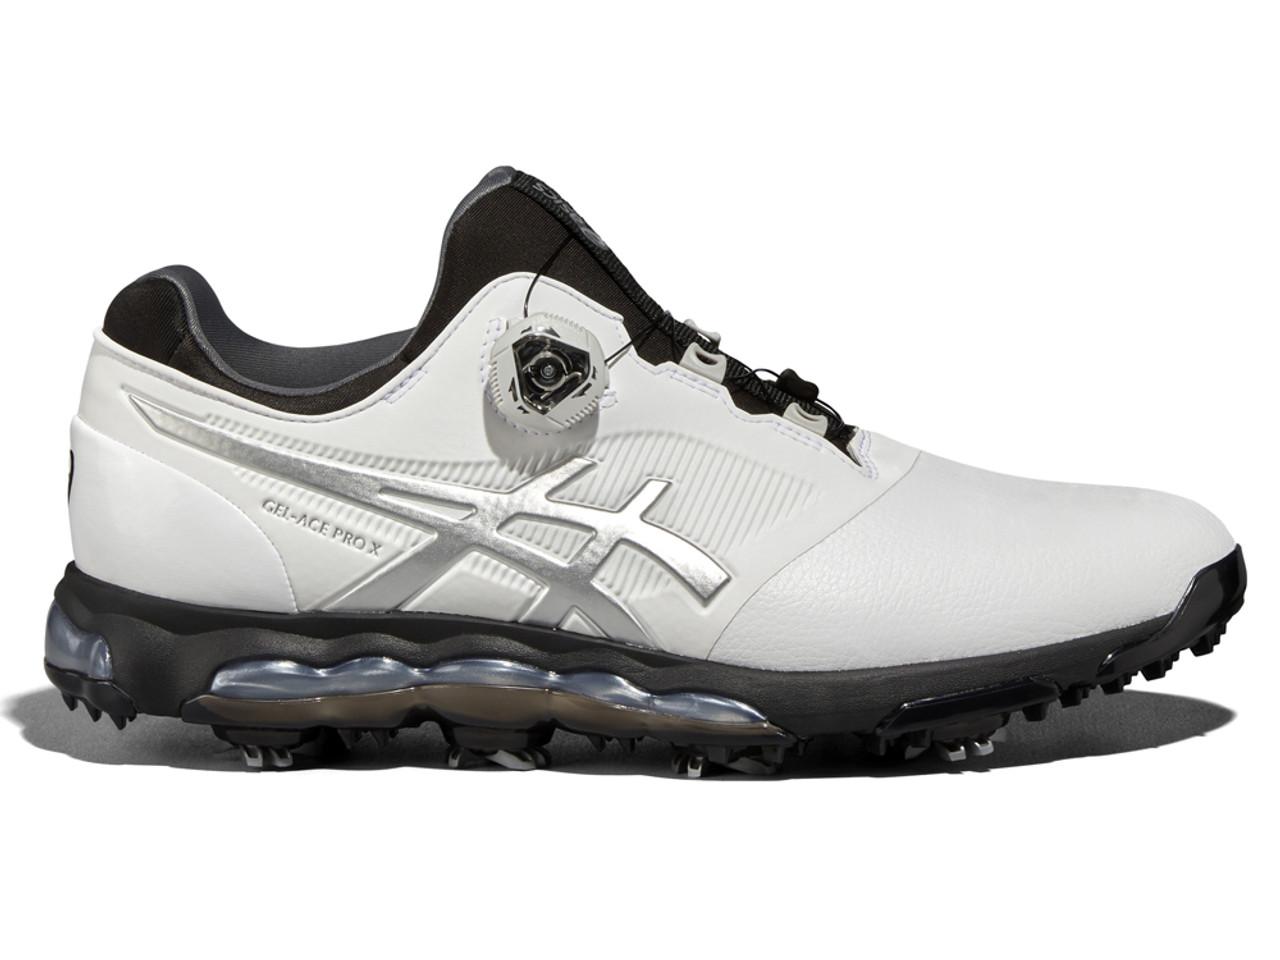 Asics Gel Ace Pro X BOA Golf Shoes